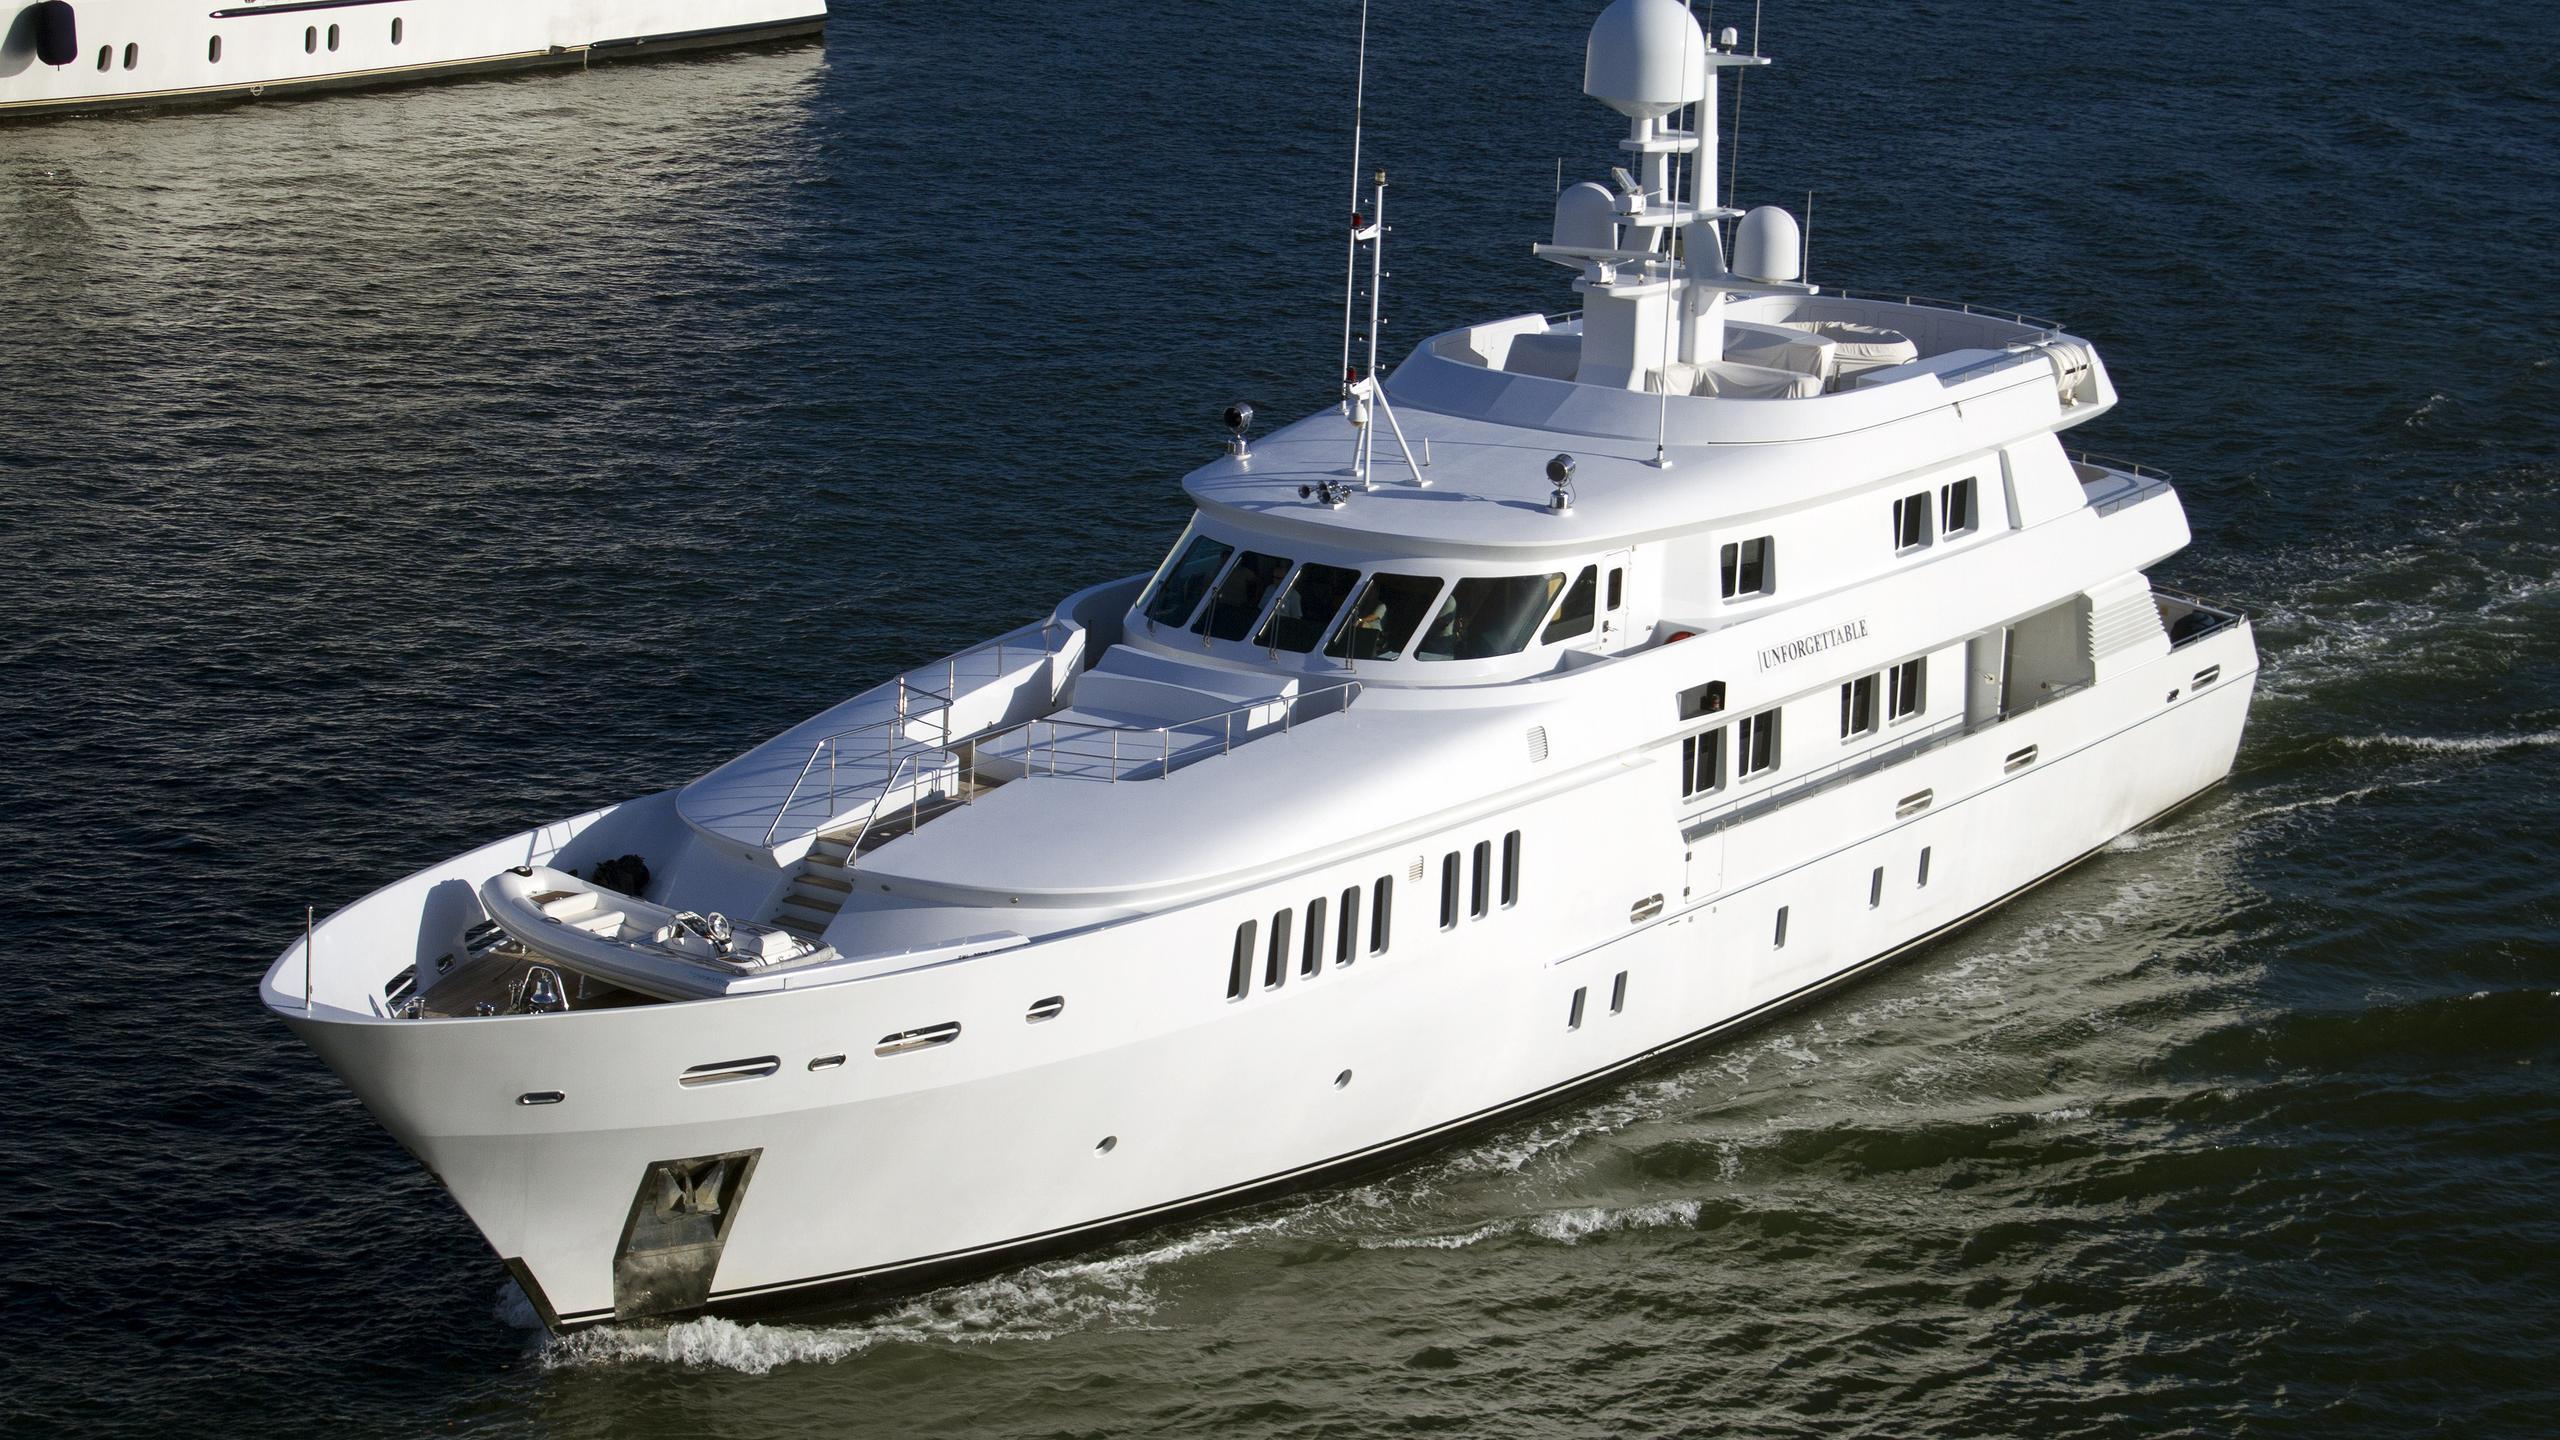 royal-denship-danyard-unforgettable-2003-motor-yacht-running